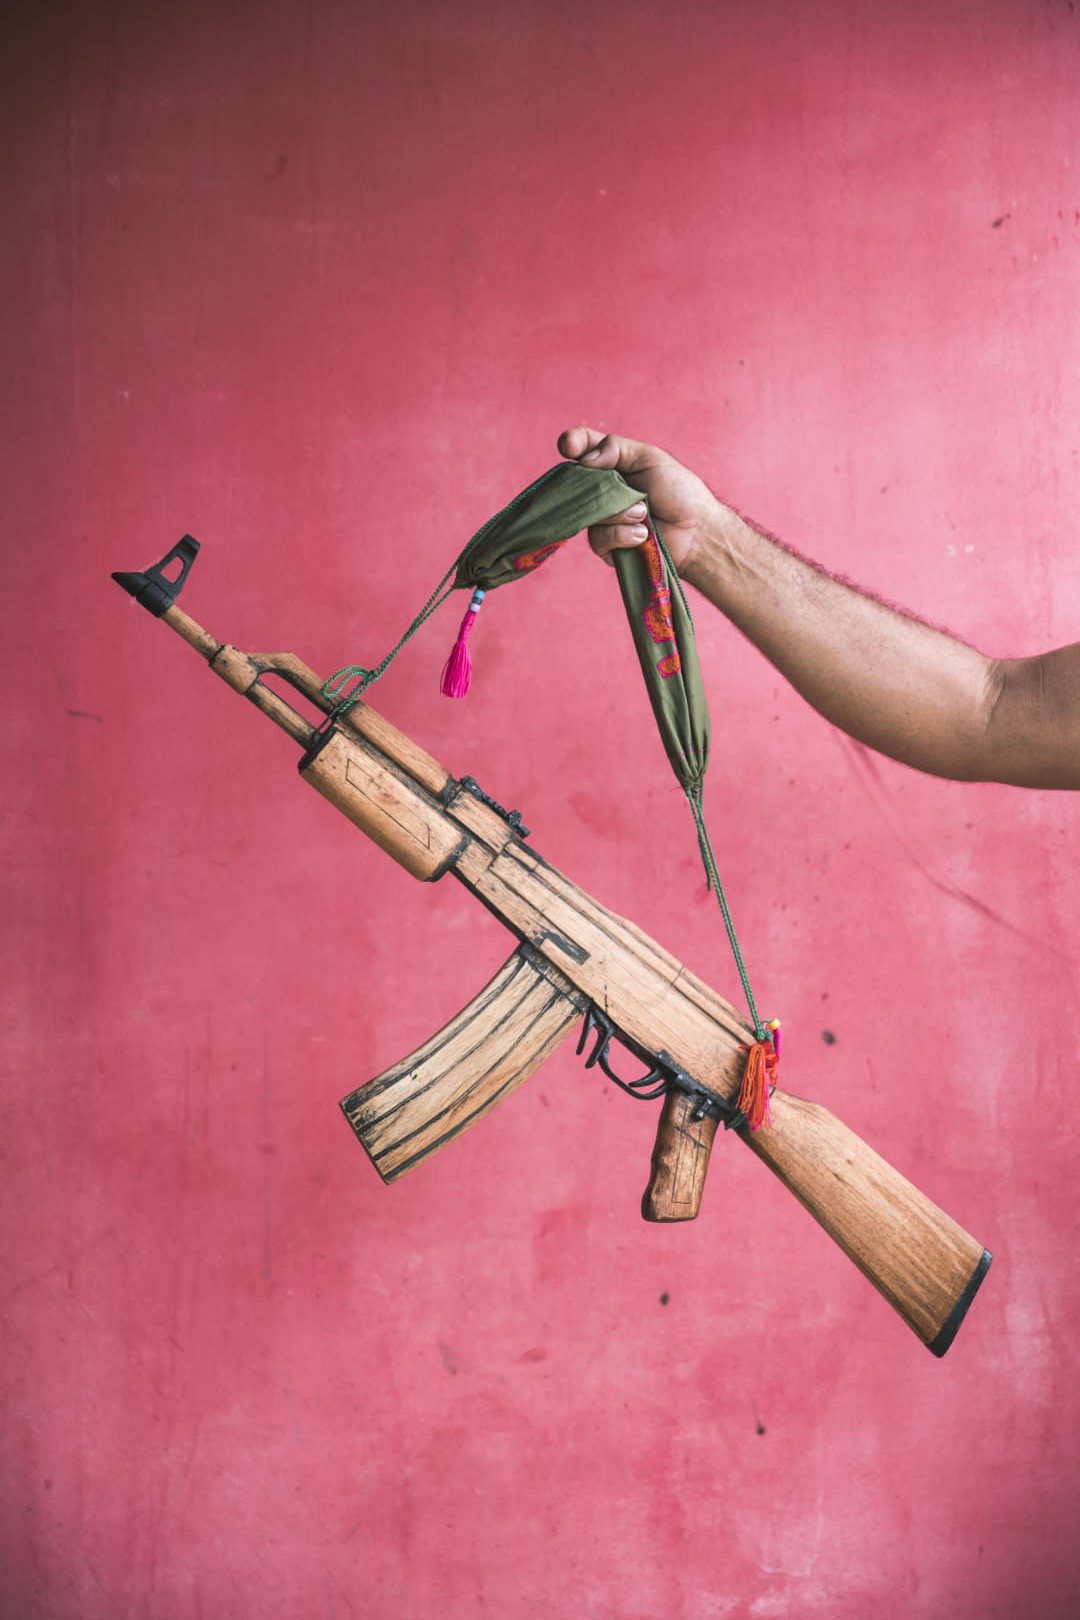 Nachbau eines AK47 Sturmgewehrs